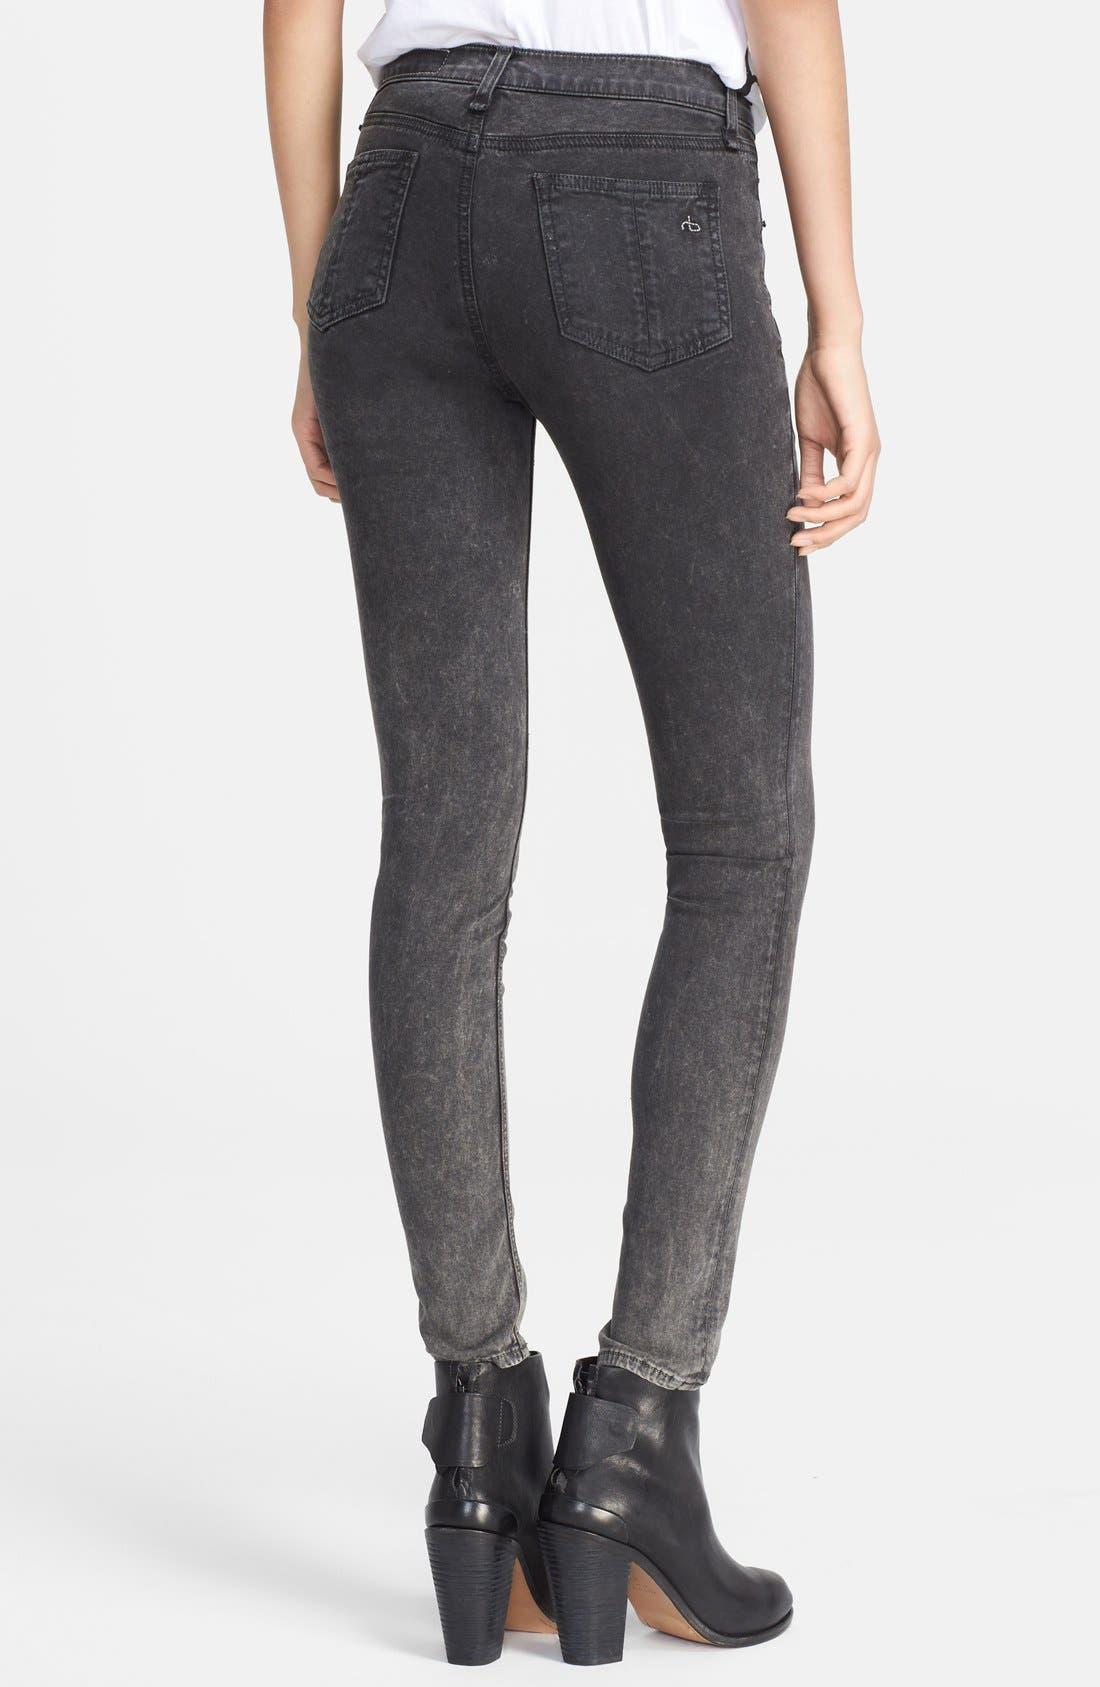 Alternate Image 2  - rag & bone/JEAN 'Justine' High Rise Skinny Jeans (Rosebowl Black)